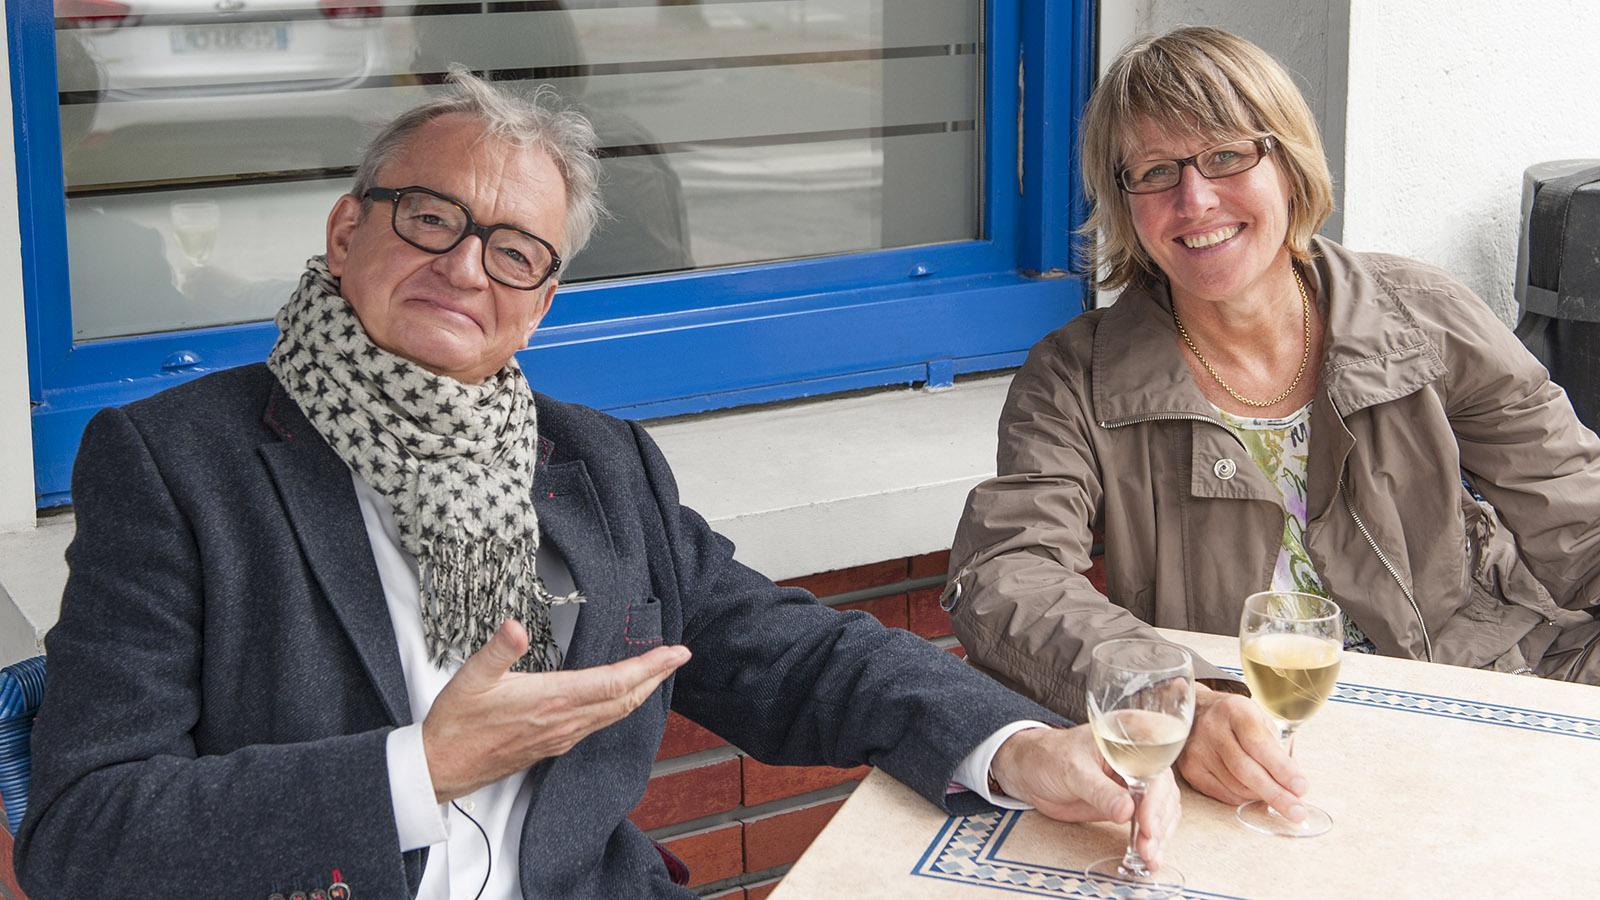 Hilke Maunder mit Jean-Luc Petitrenaud in Le Havre. Foto: Hilke Maunder